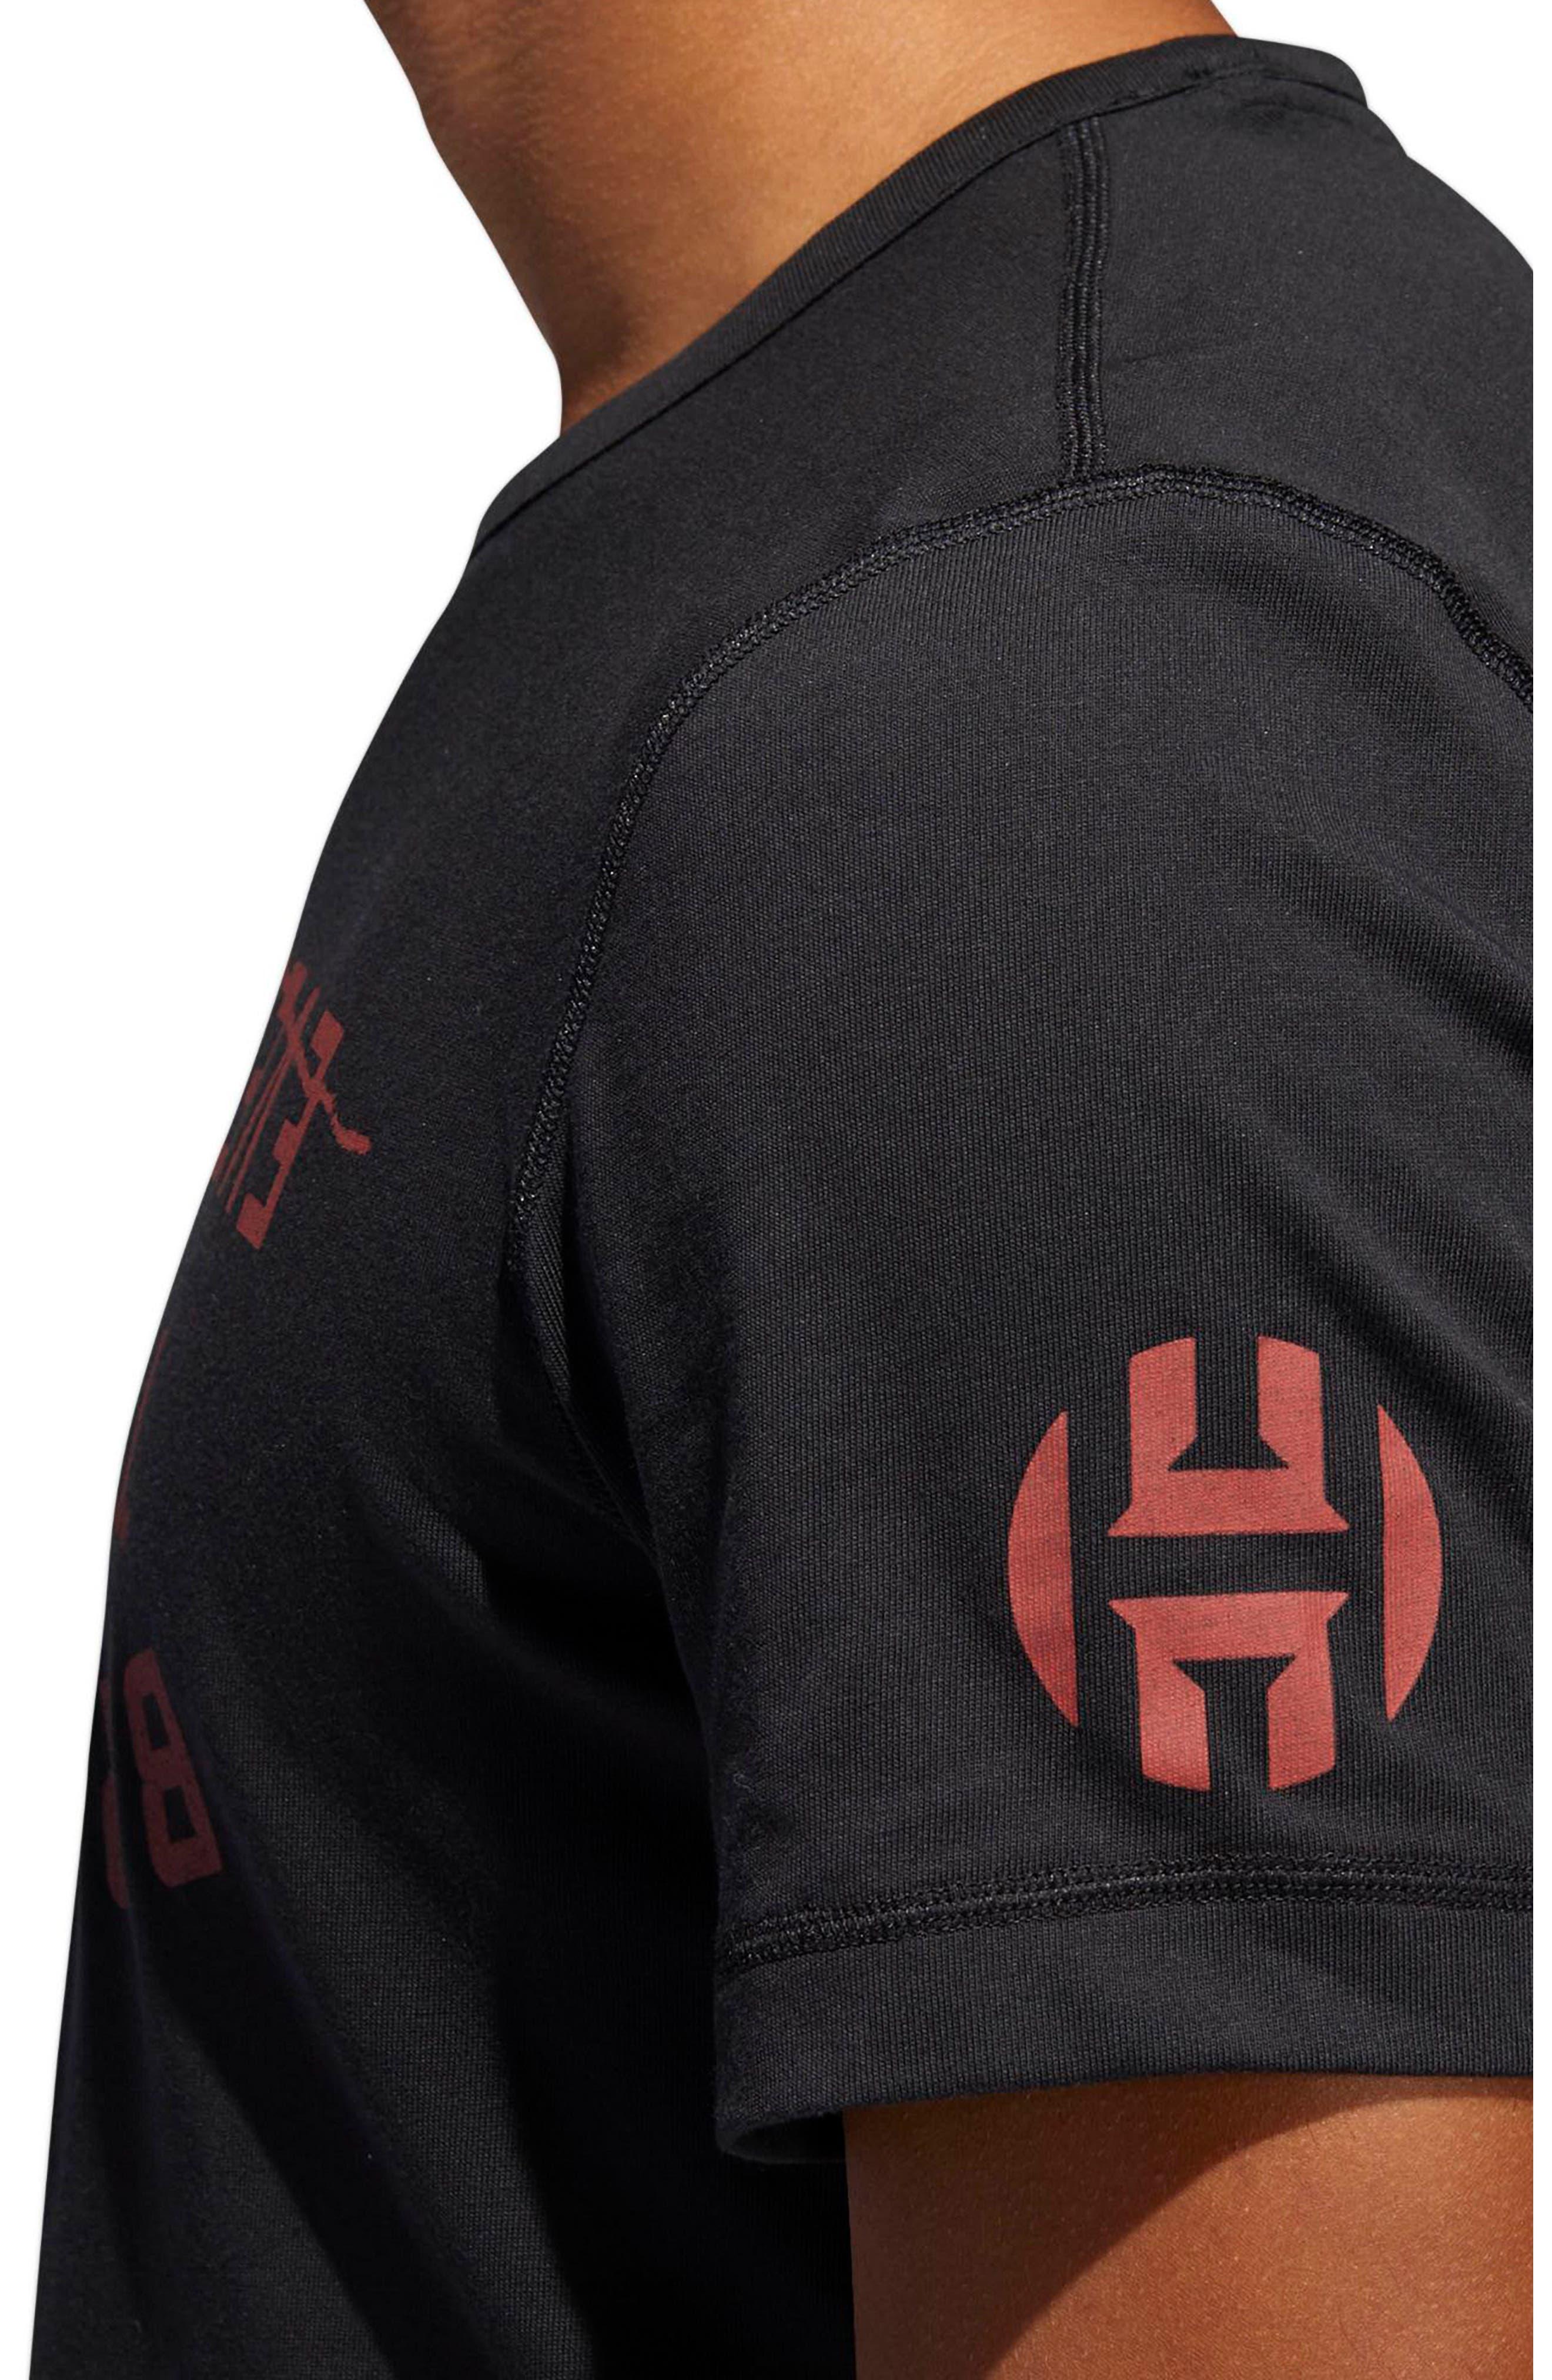 Harden Brand Slogan T-Shirt,                             Alternate thumbnail 4, color,                             Black